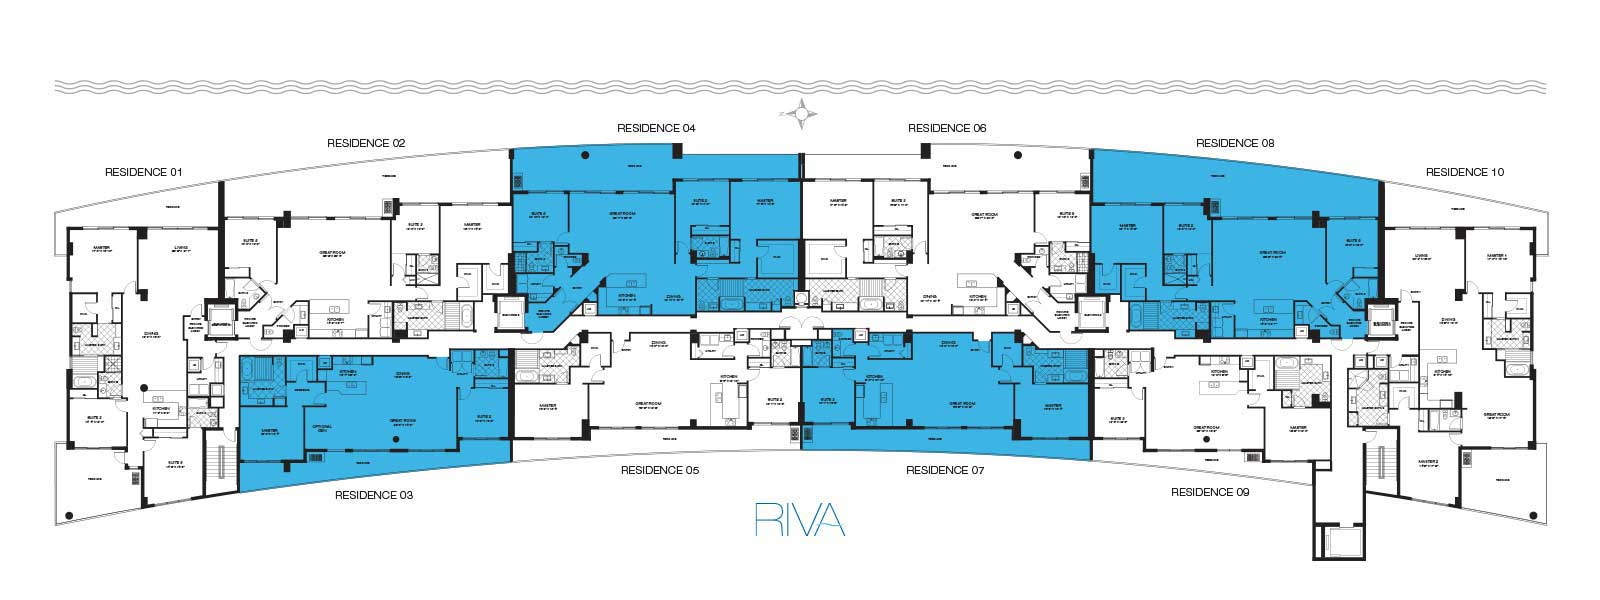 Riva Condos Fort Lauderdale Floor Plans Key SM